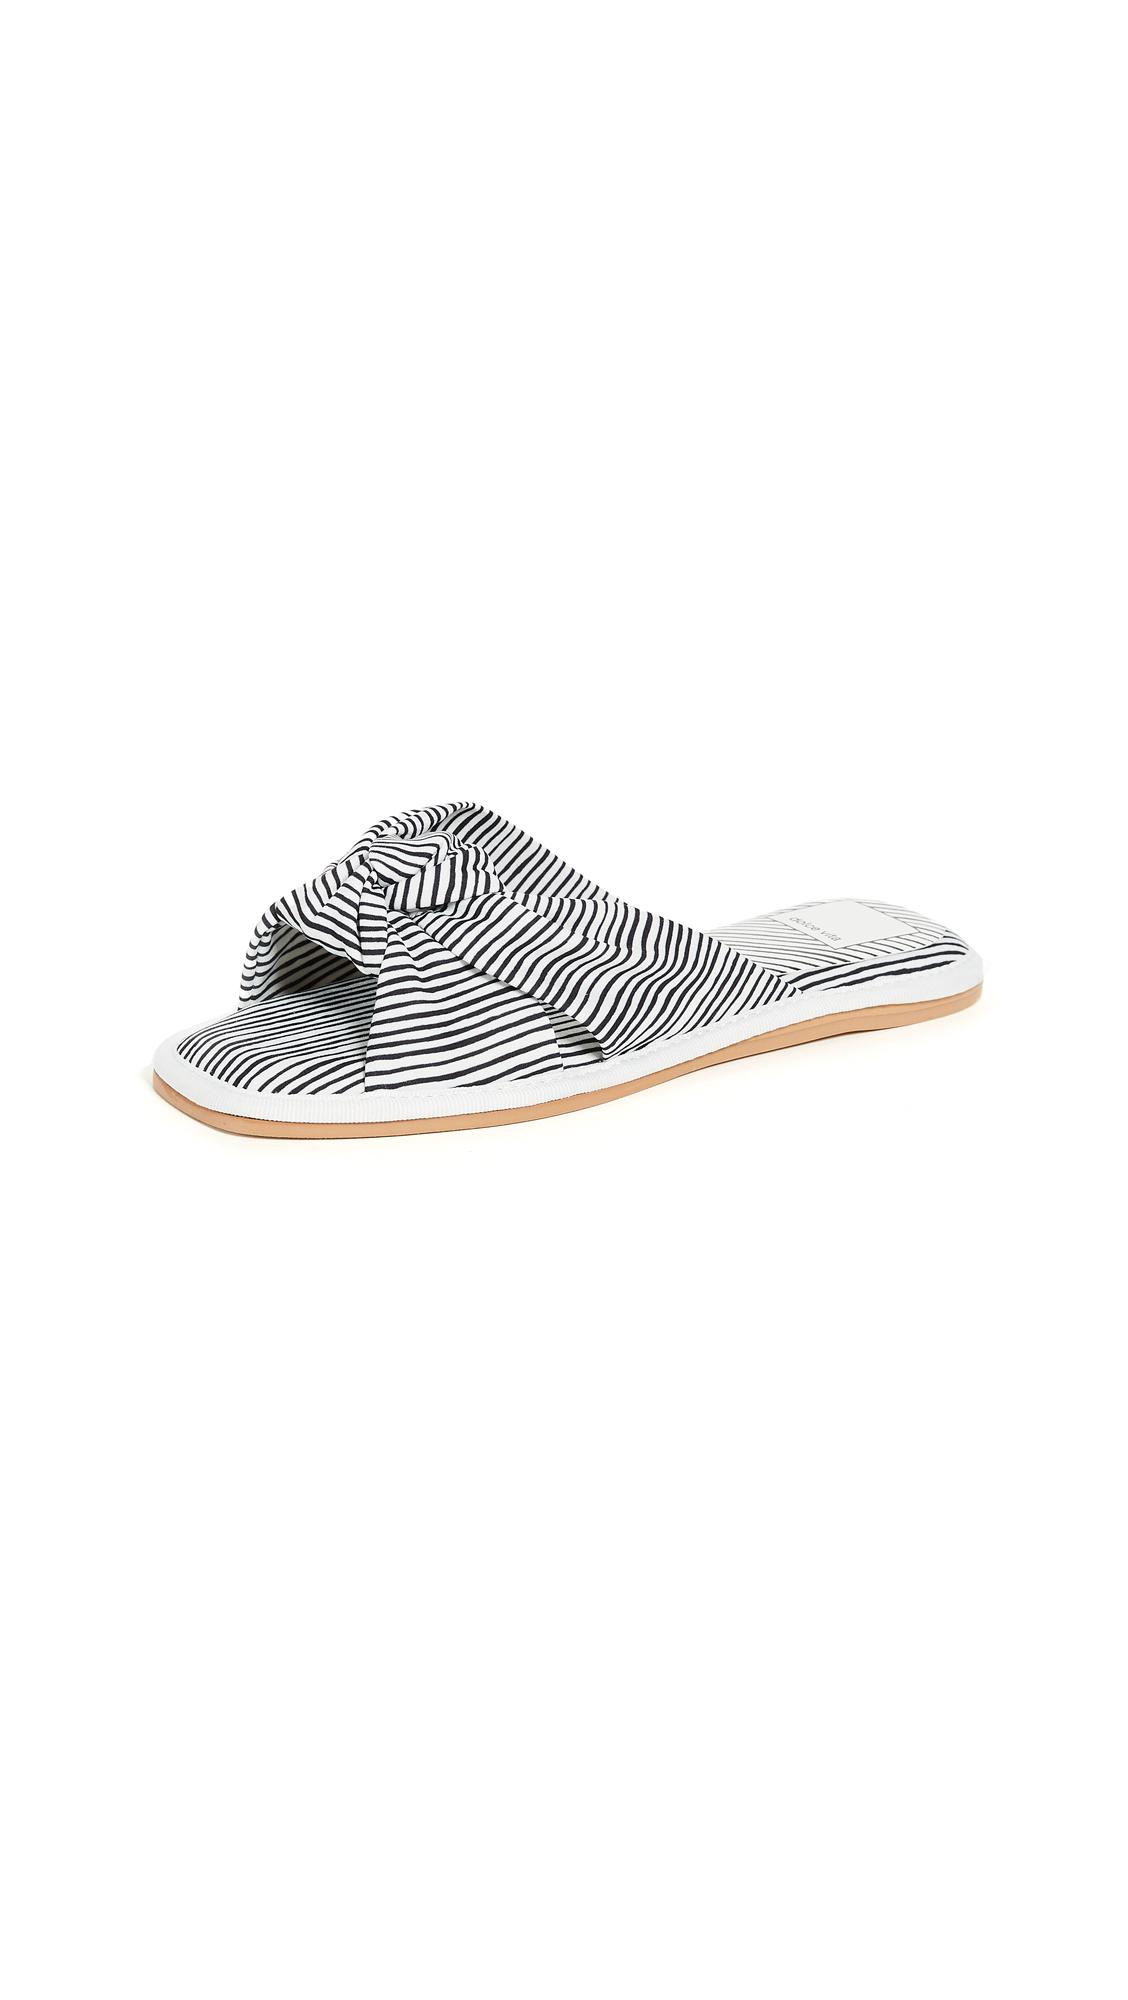 Dolce Vita Halle Slides - White Stripe